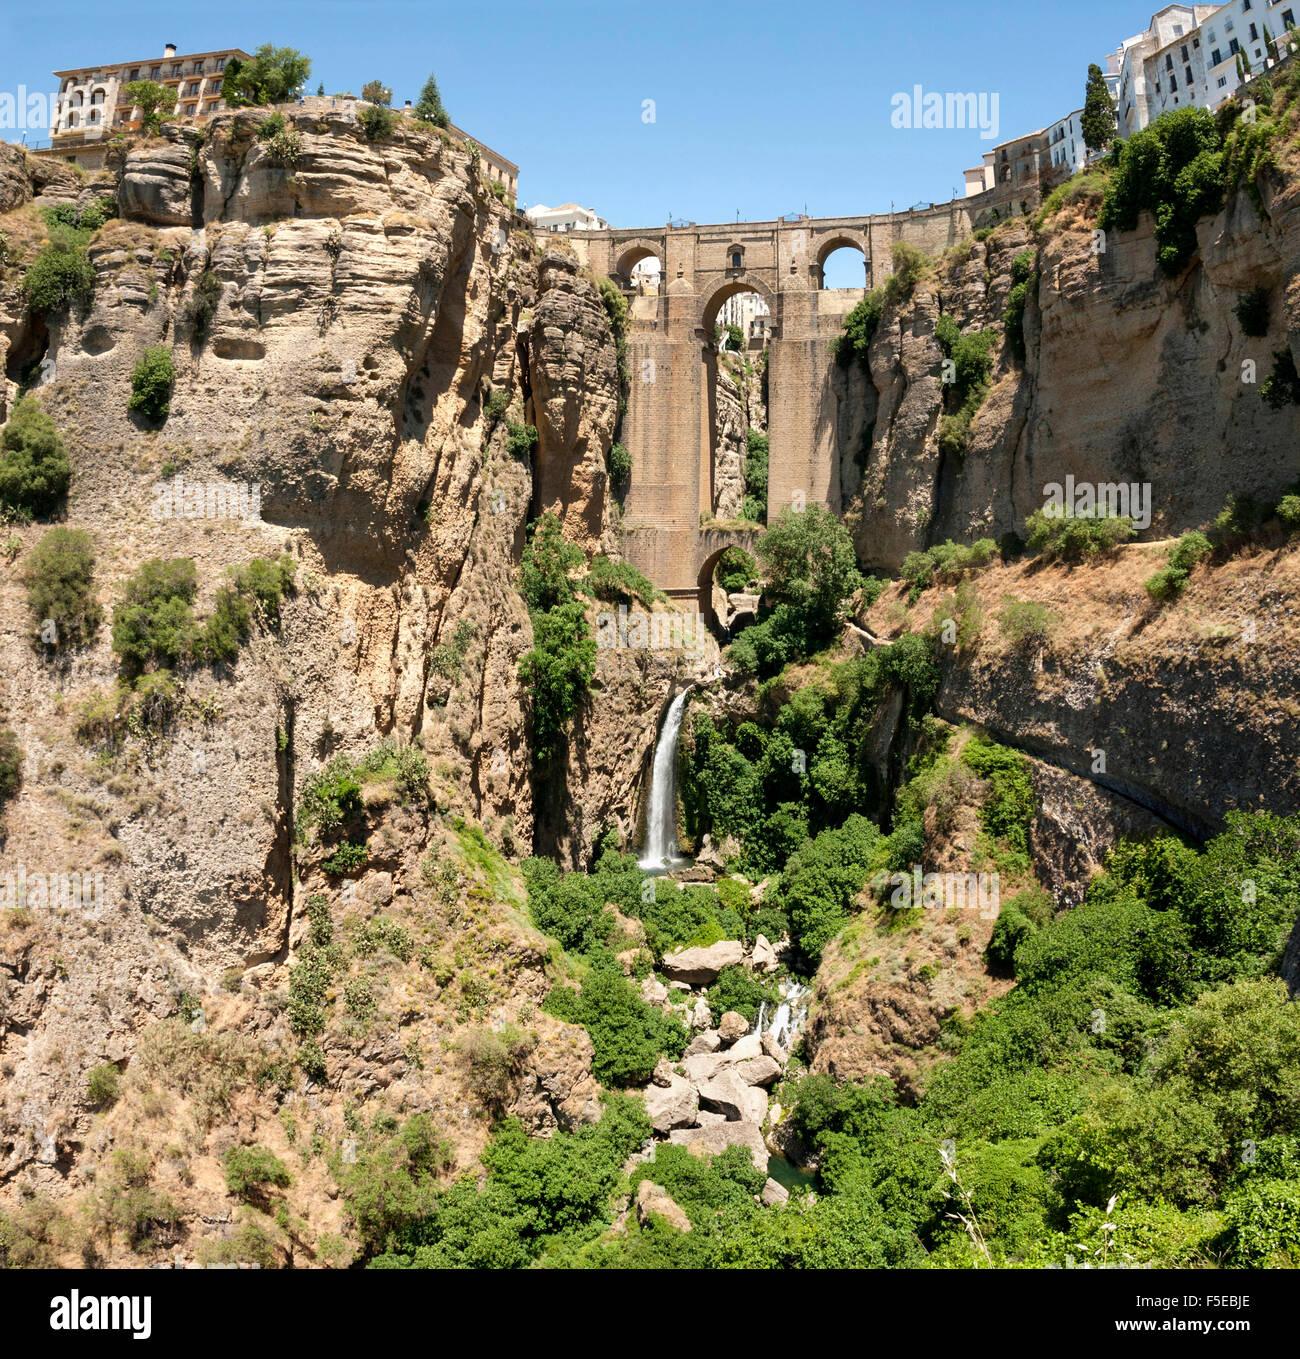 El Tajo gorge and the Puente Viejo, Ronda, Malaga province, Andalucia, Spain, Europe - Stock Image